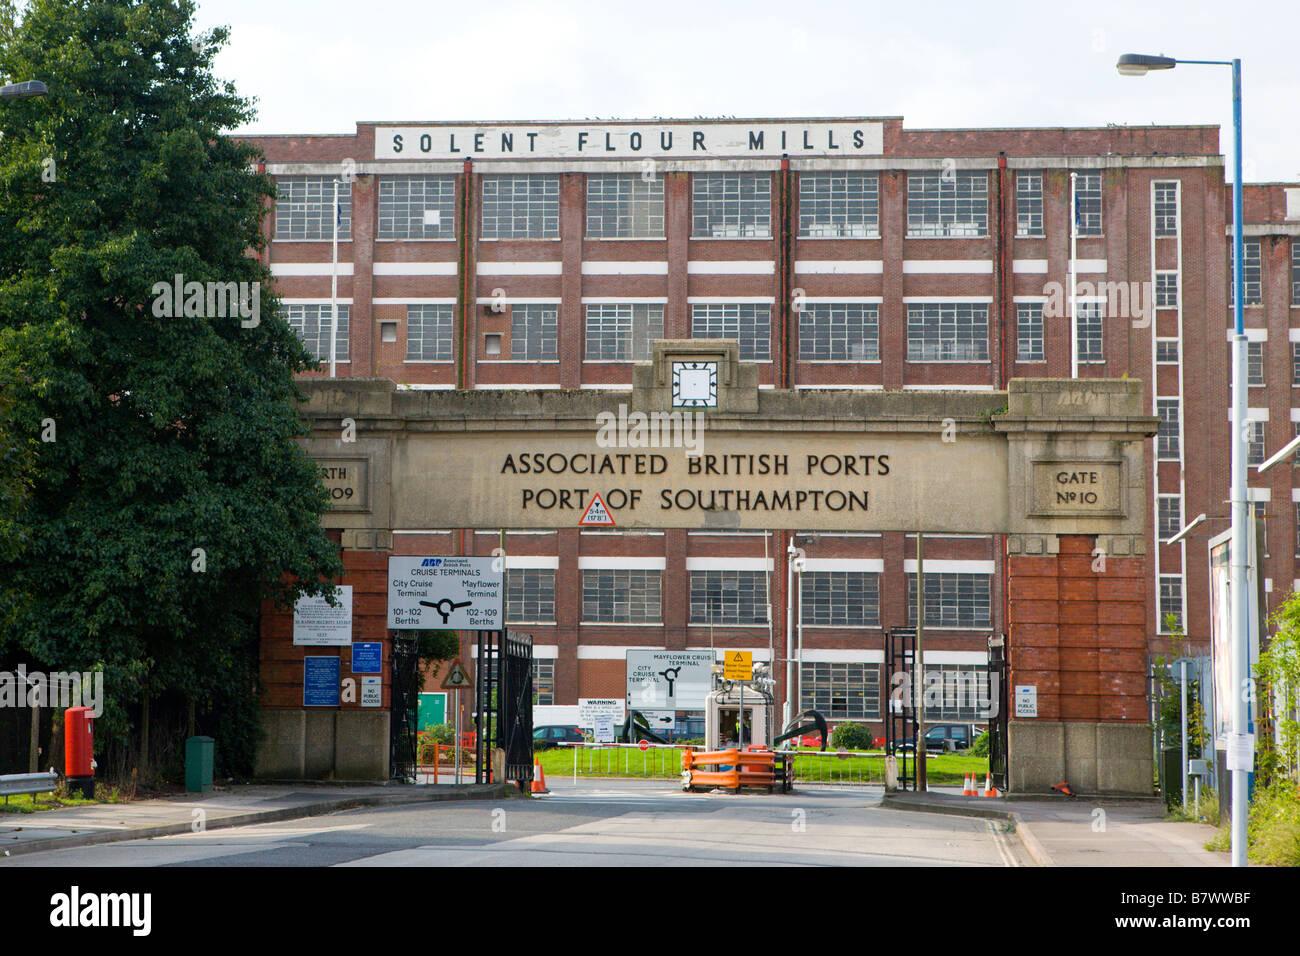 Port of Southampton dock gates and Solent Flour Mills building Southampton Hampshire England - Stock Image